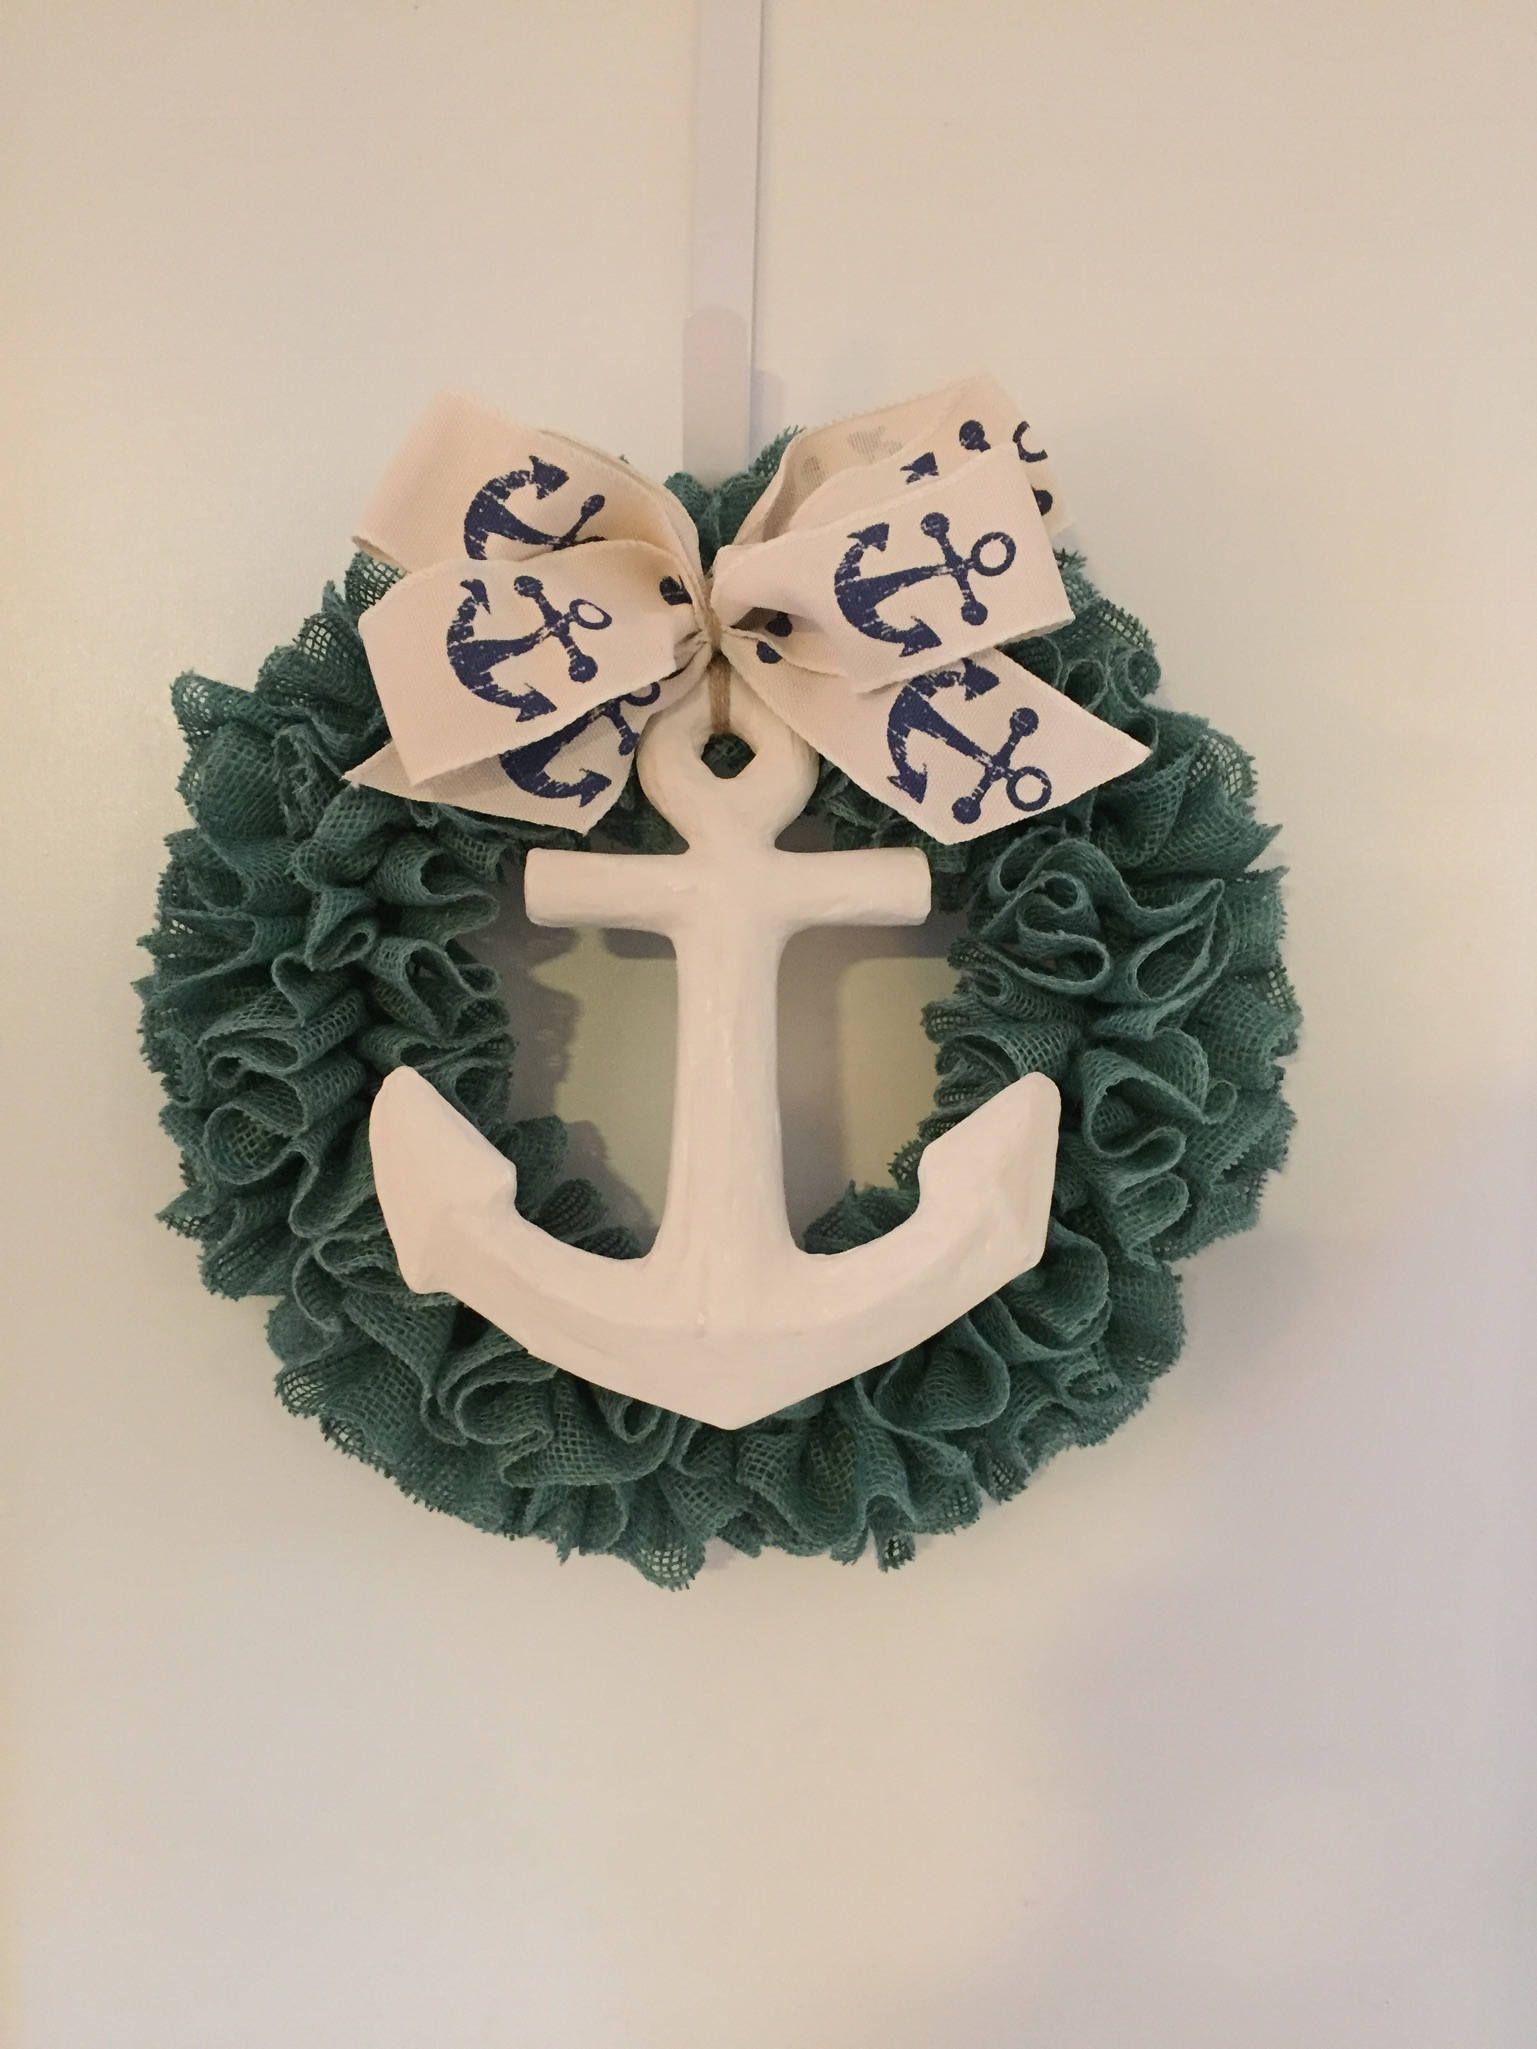 Burlap Wall Decor anchor wreath, natural burlap, white anchor, turquoise burlap